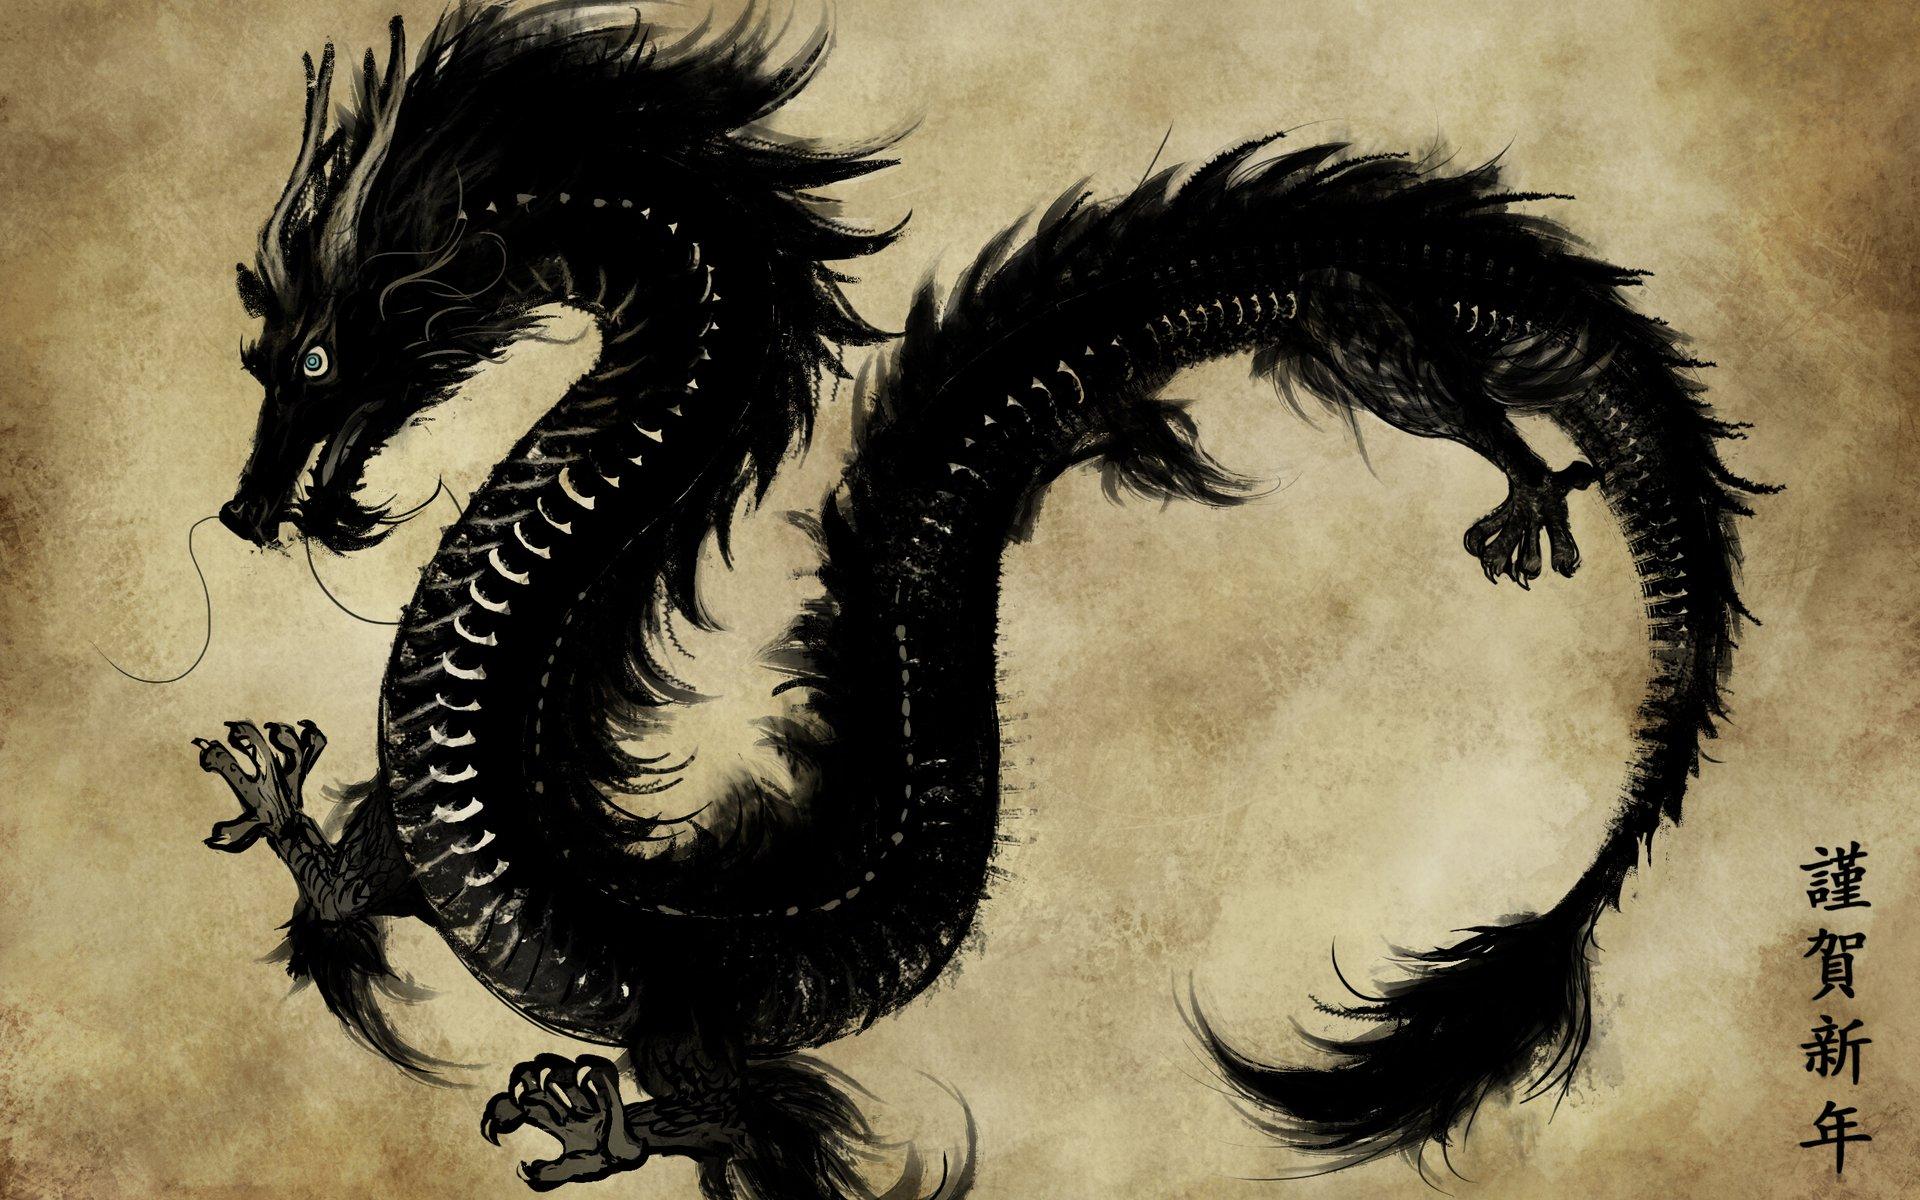 Hd wallpaper dragon - Hd Wallpaper Background Id 207266 1920x1200 Artistic Dragon